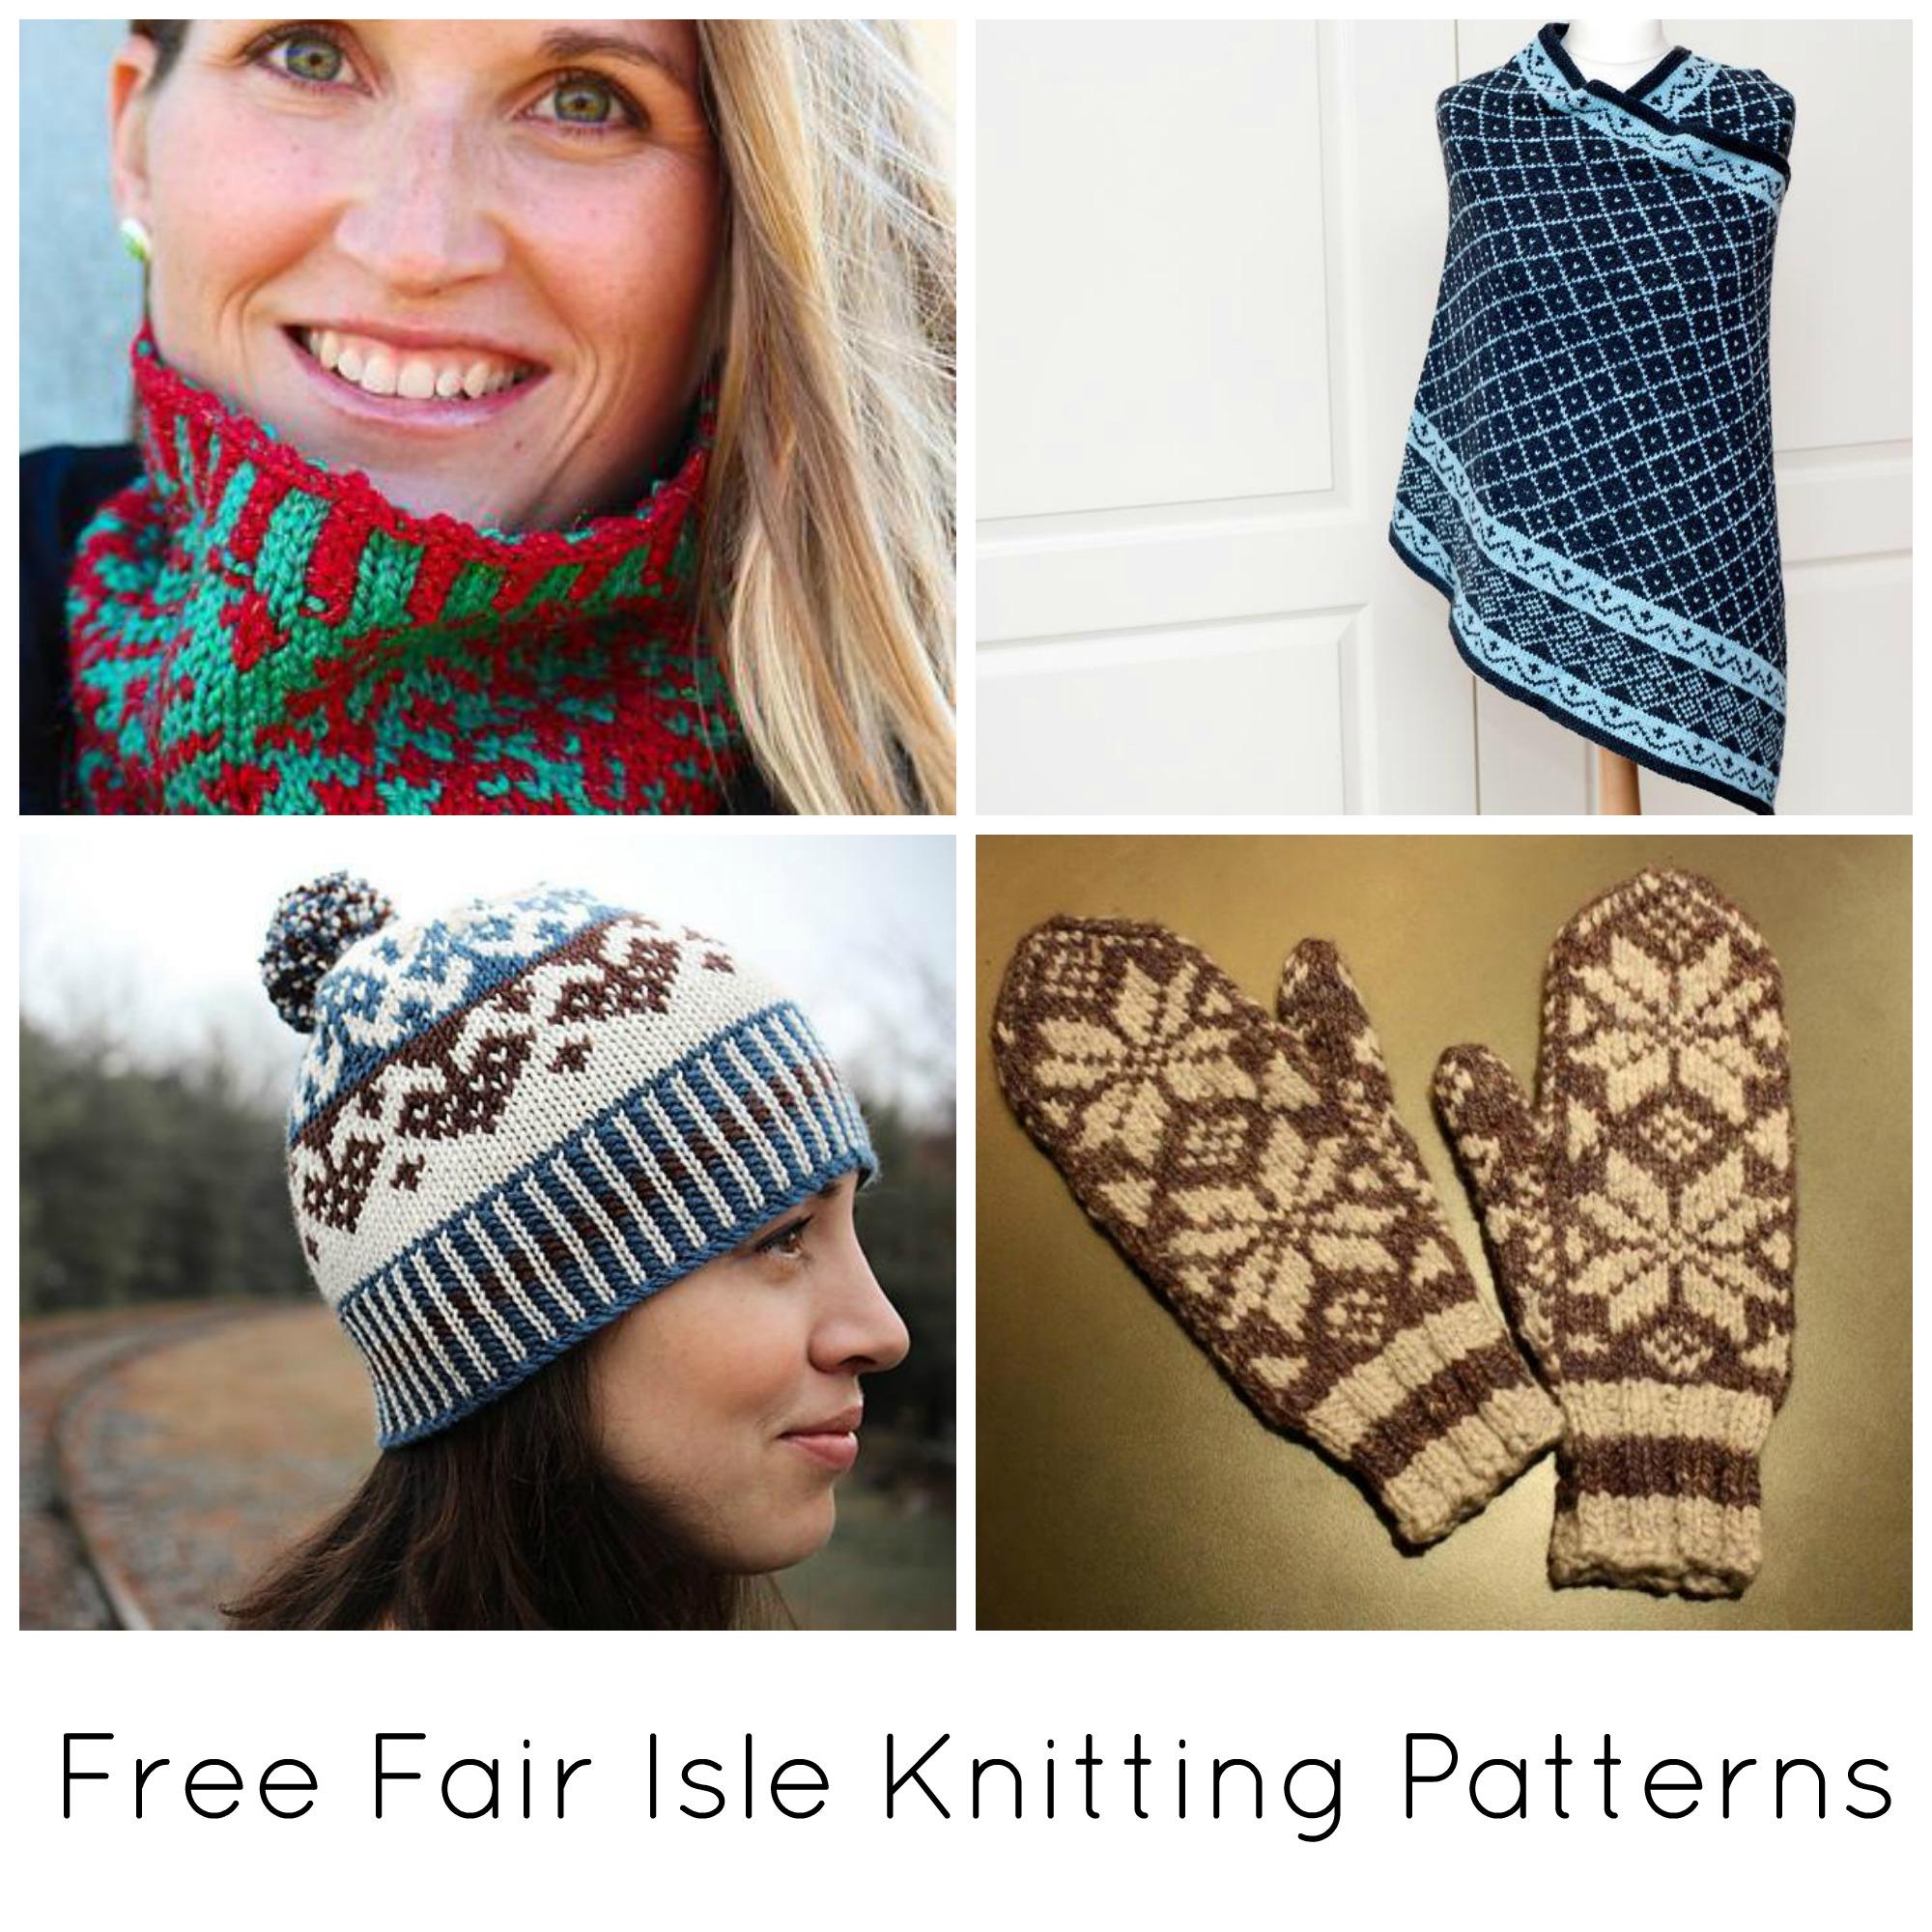 Stranded Knitting Patterns Free 10 Free Fair Isle Knitting Patterns On Craftsy